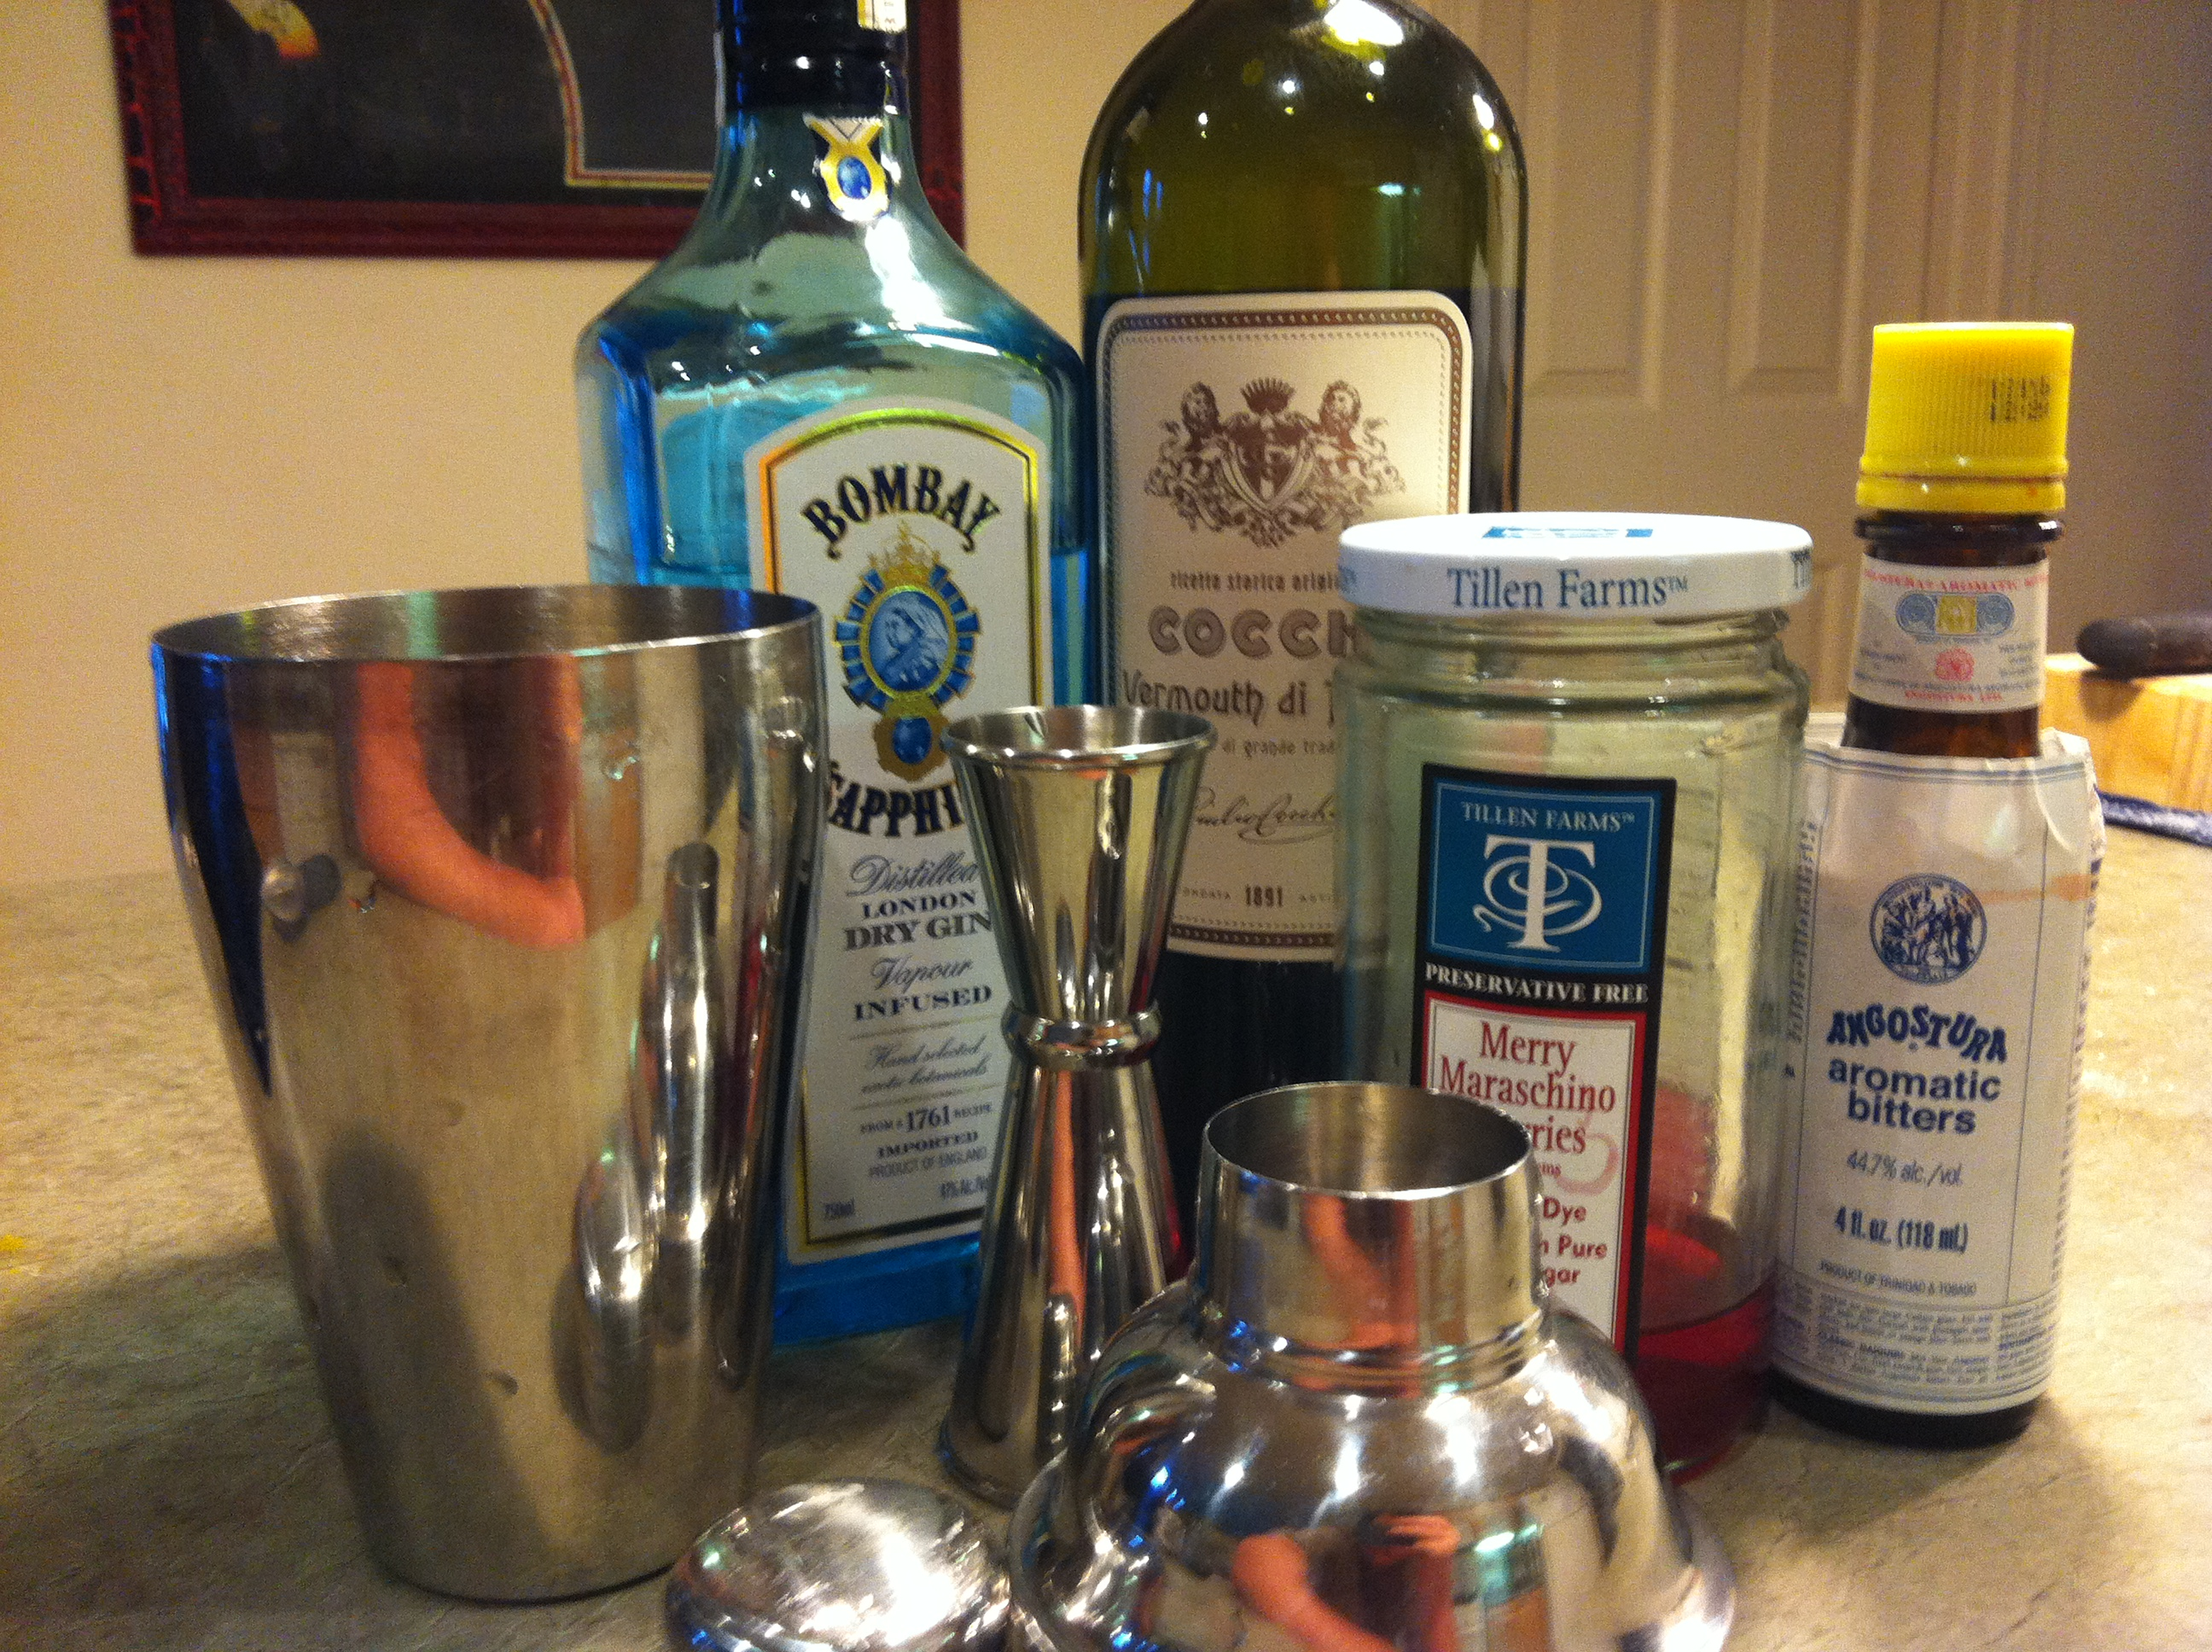 Friday Happy Hour: The Martinez